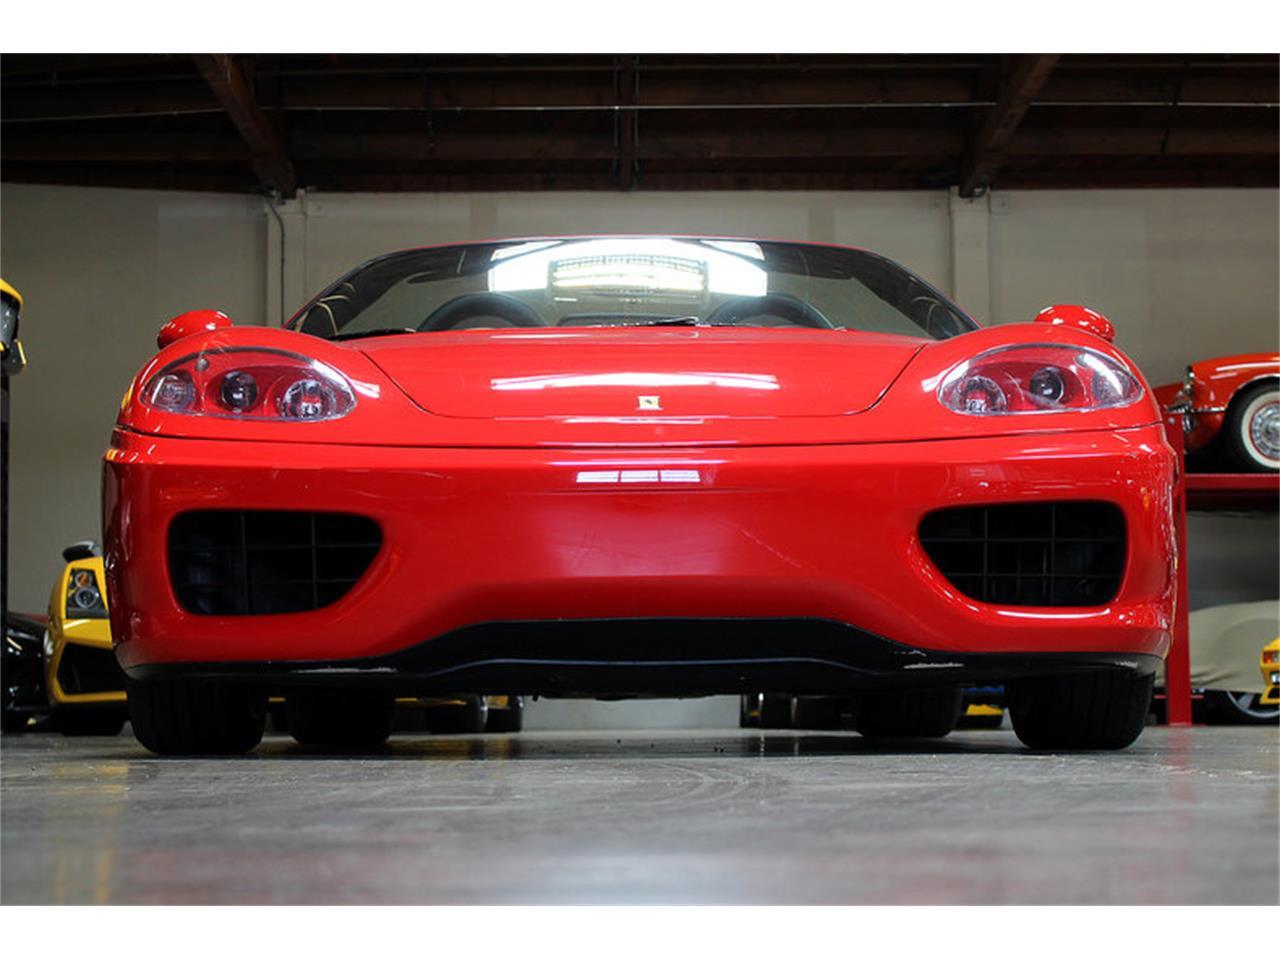 Large Picture of 2004 360 located in San Carlos California - $149,995.00 - LSDU